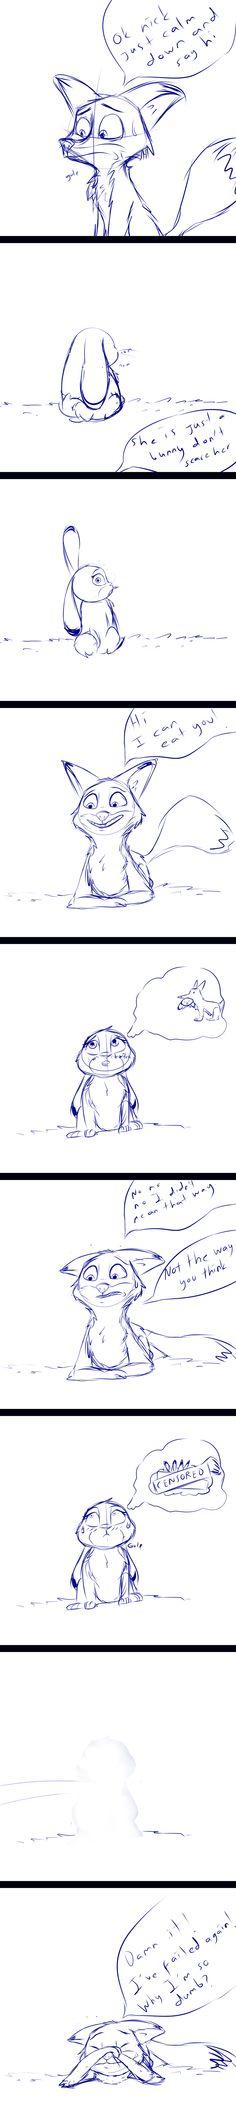 Say Hi - Short sketch comic by gokhan16